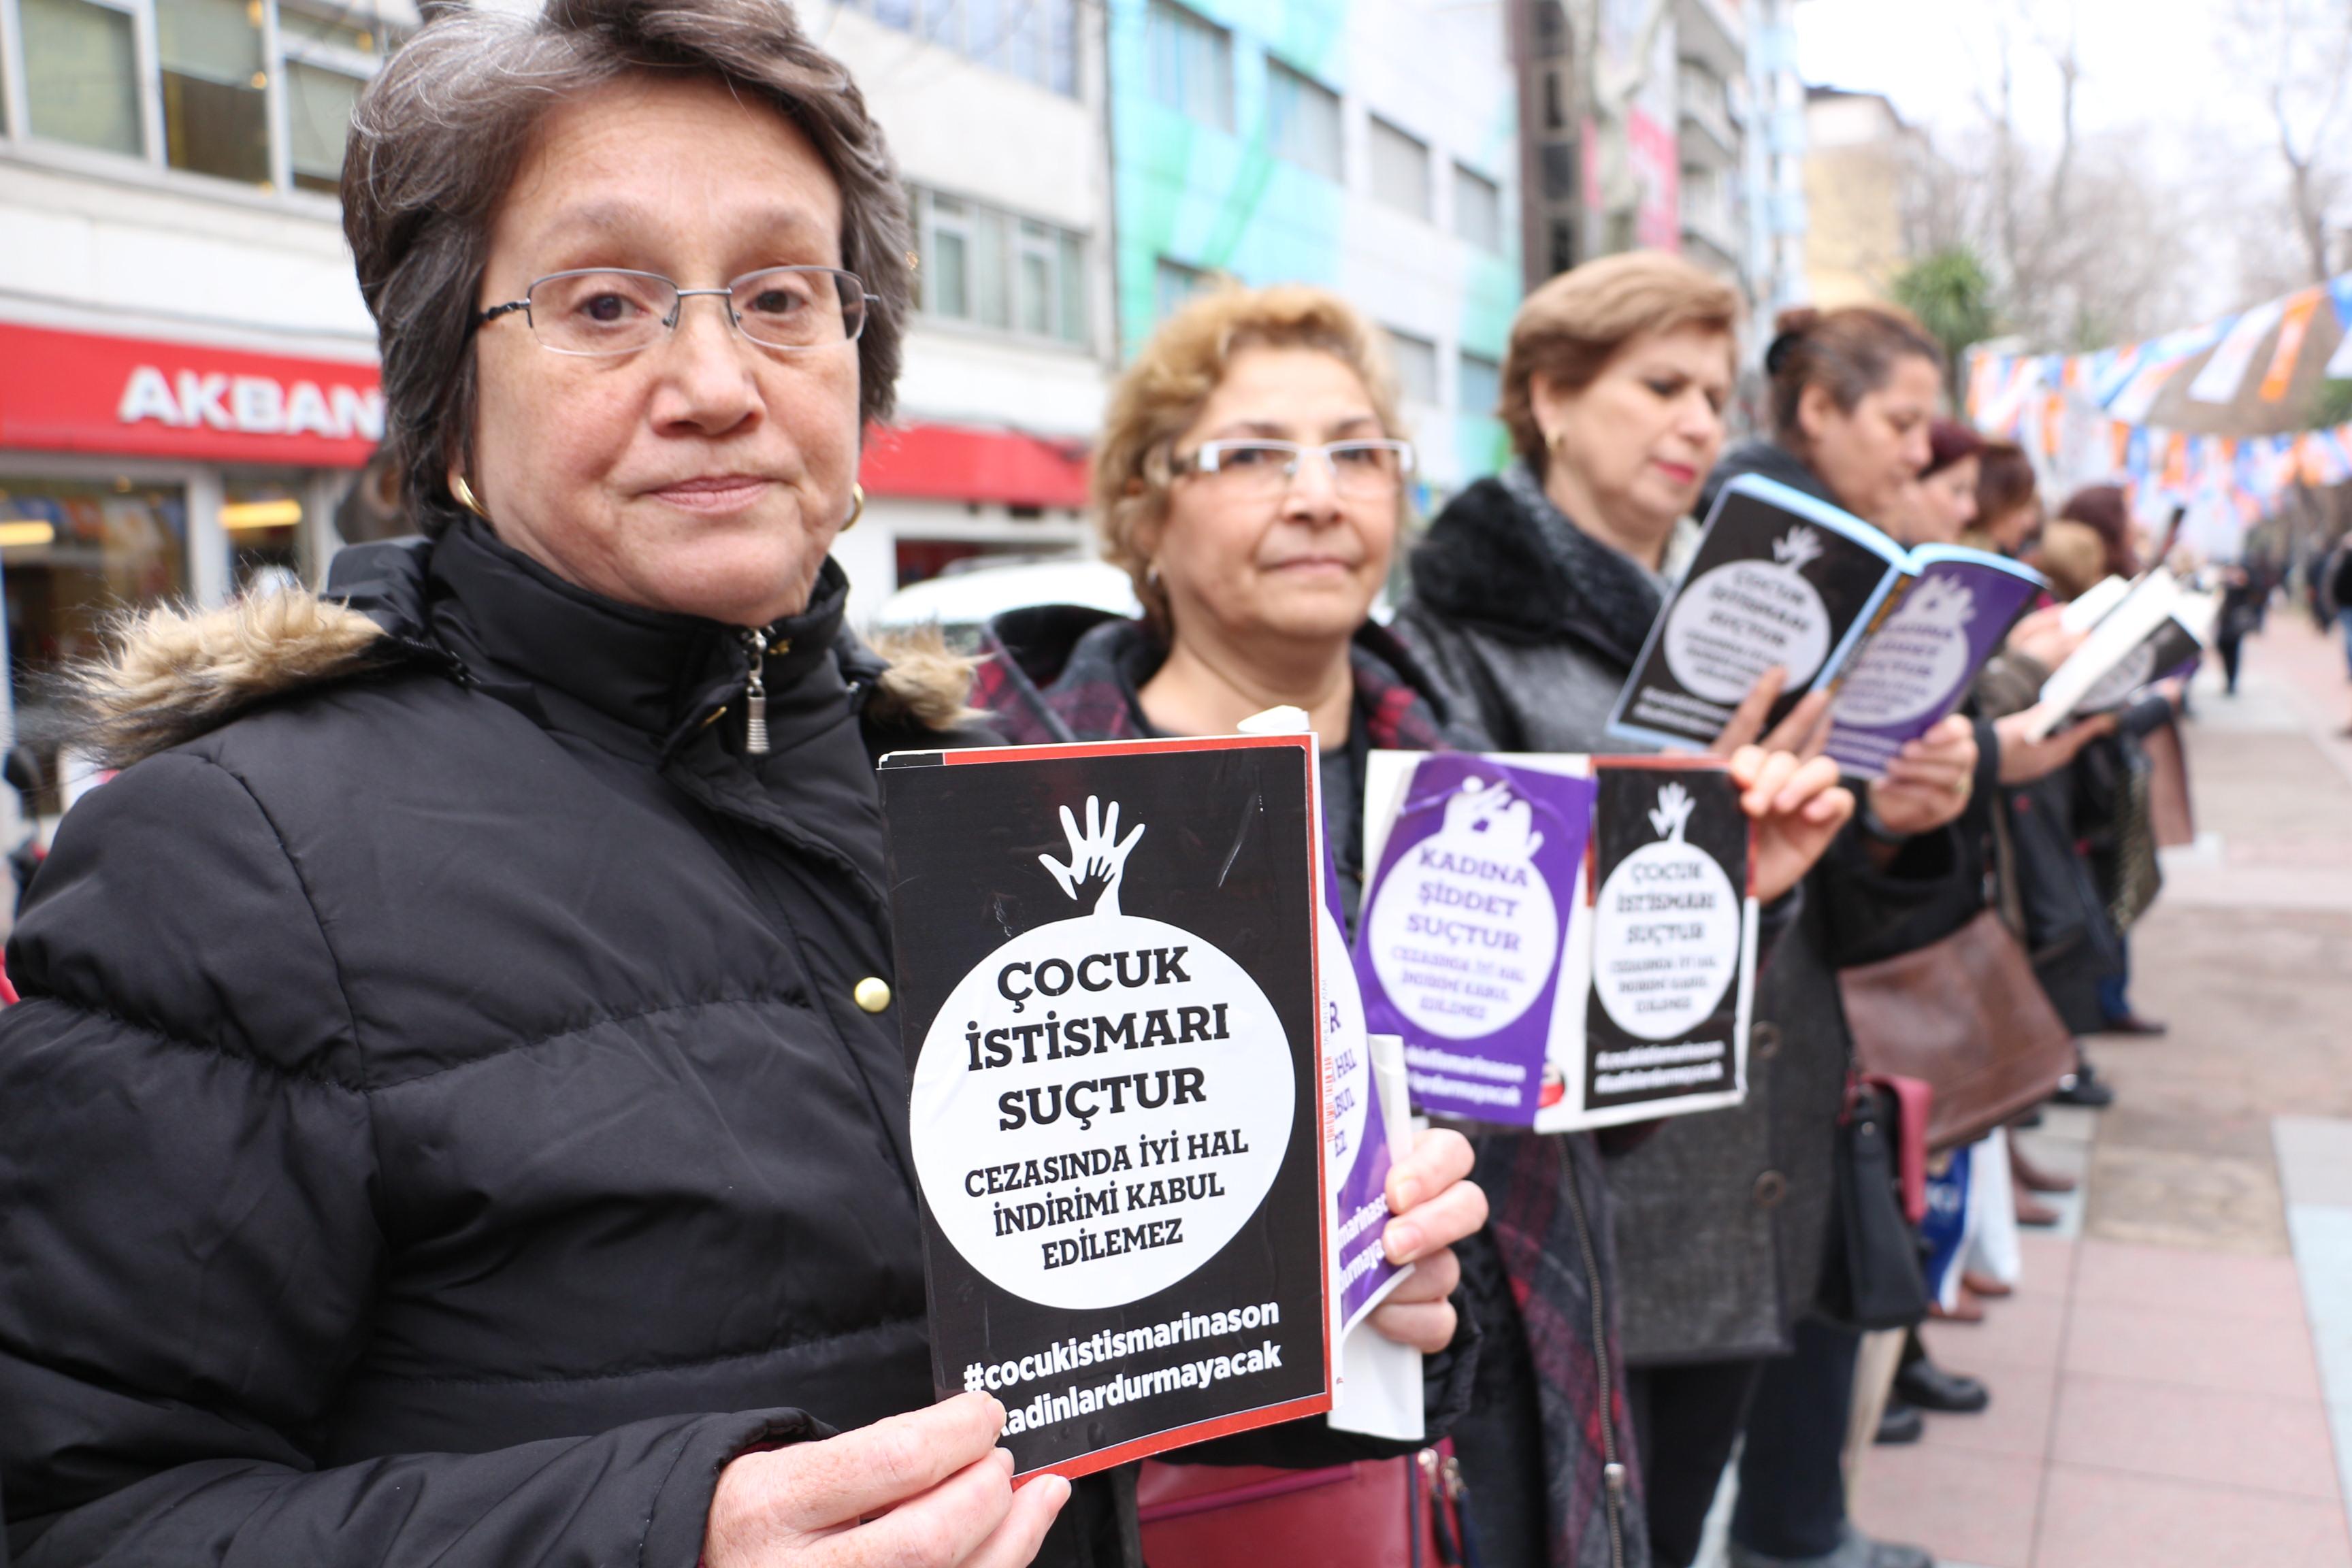 CHP'li kadınlardan çocuk istismarına  karşı sessiz eylem